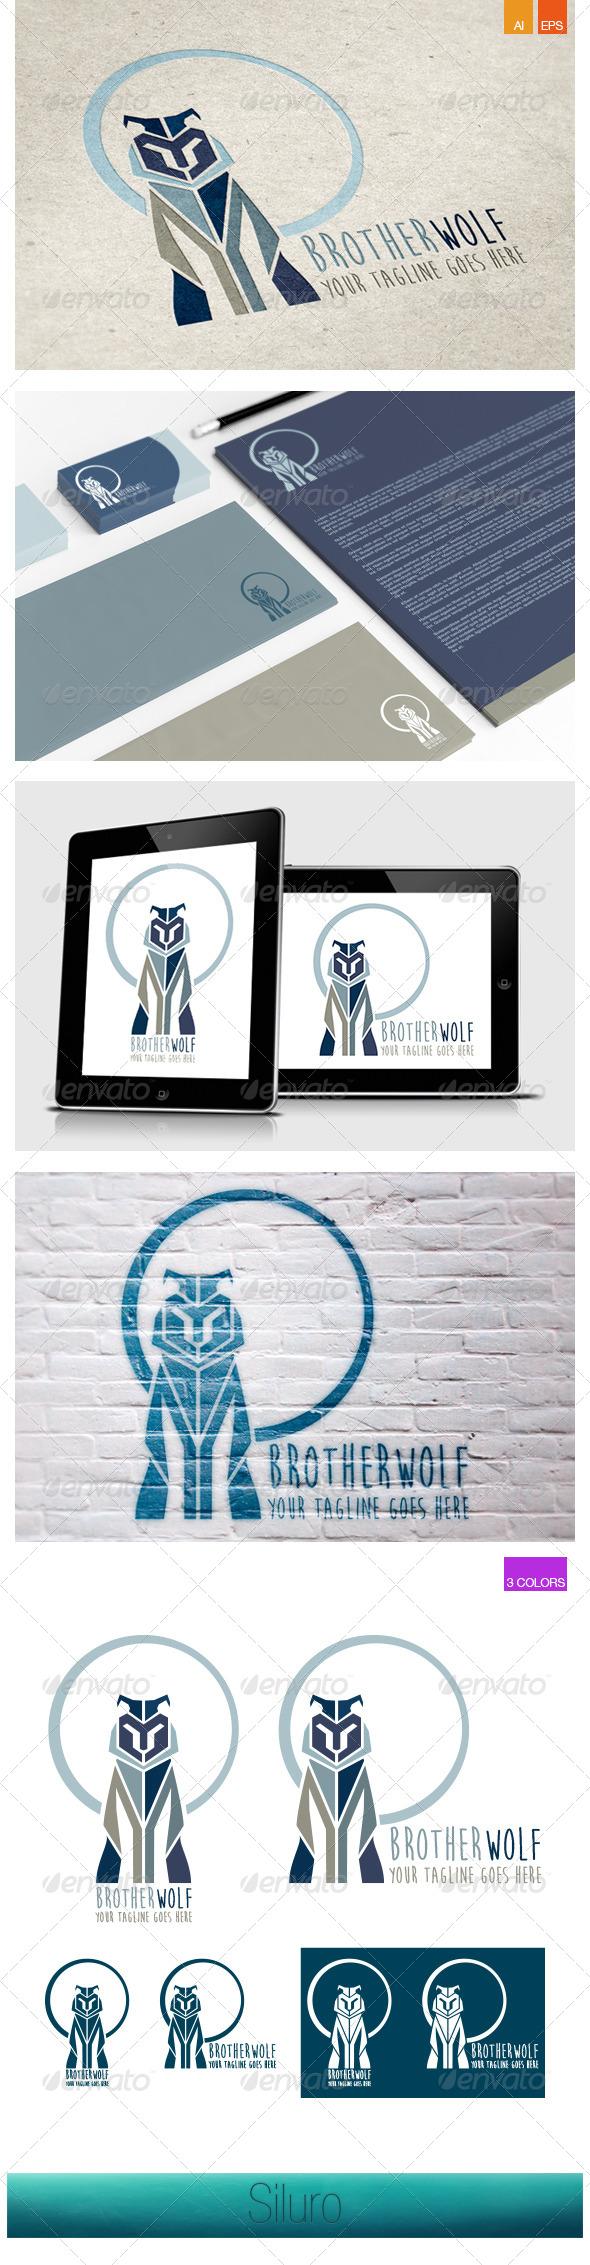 GraphicRiver BrotherWolf Logo 8005376